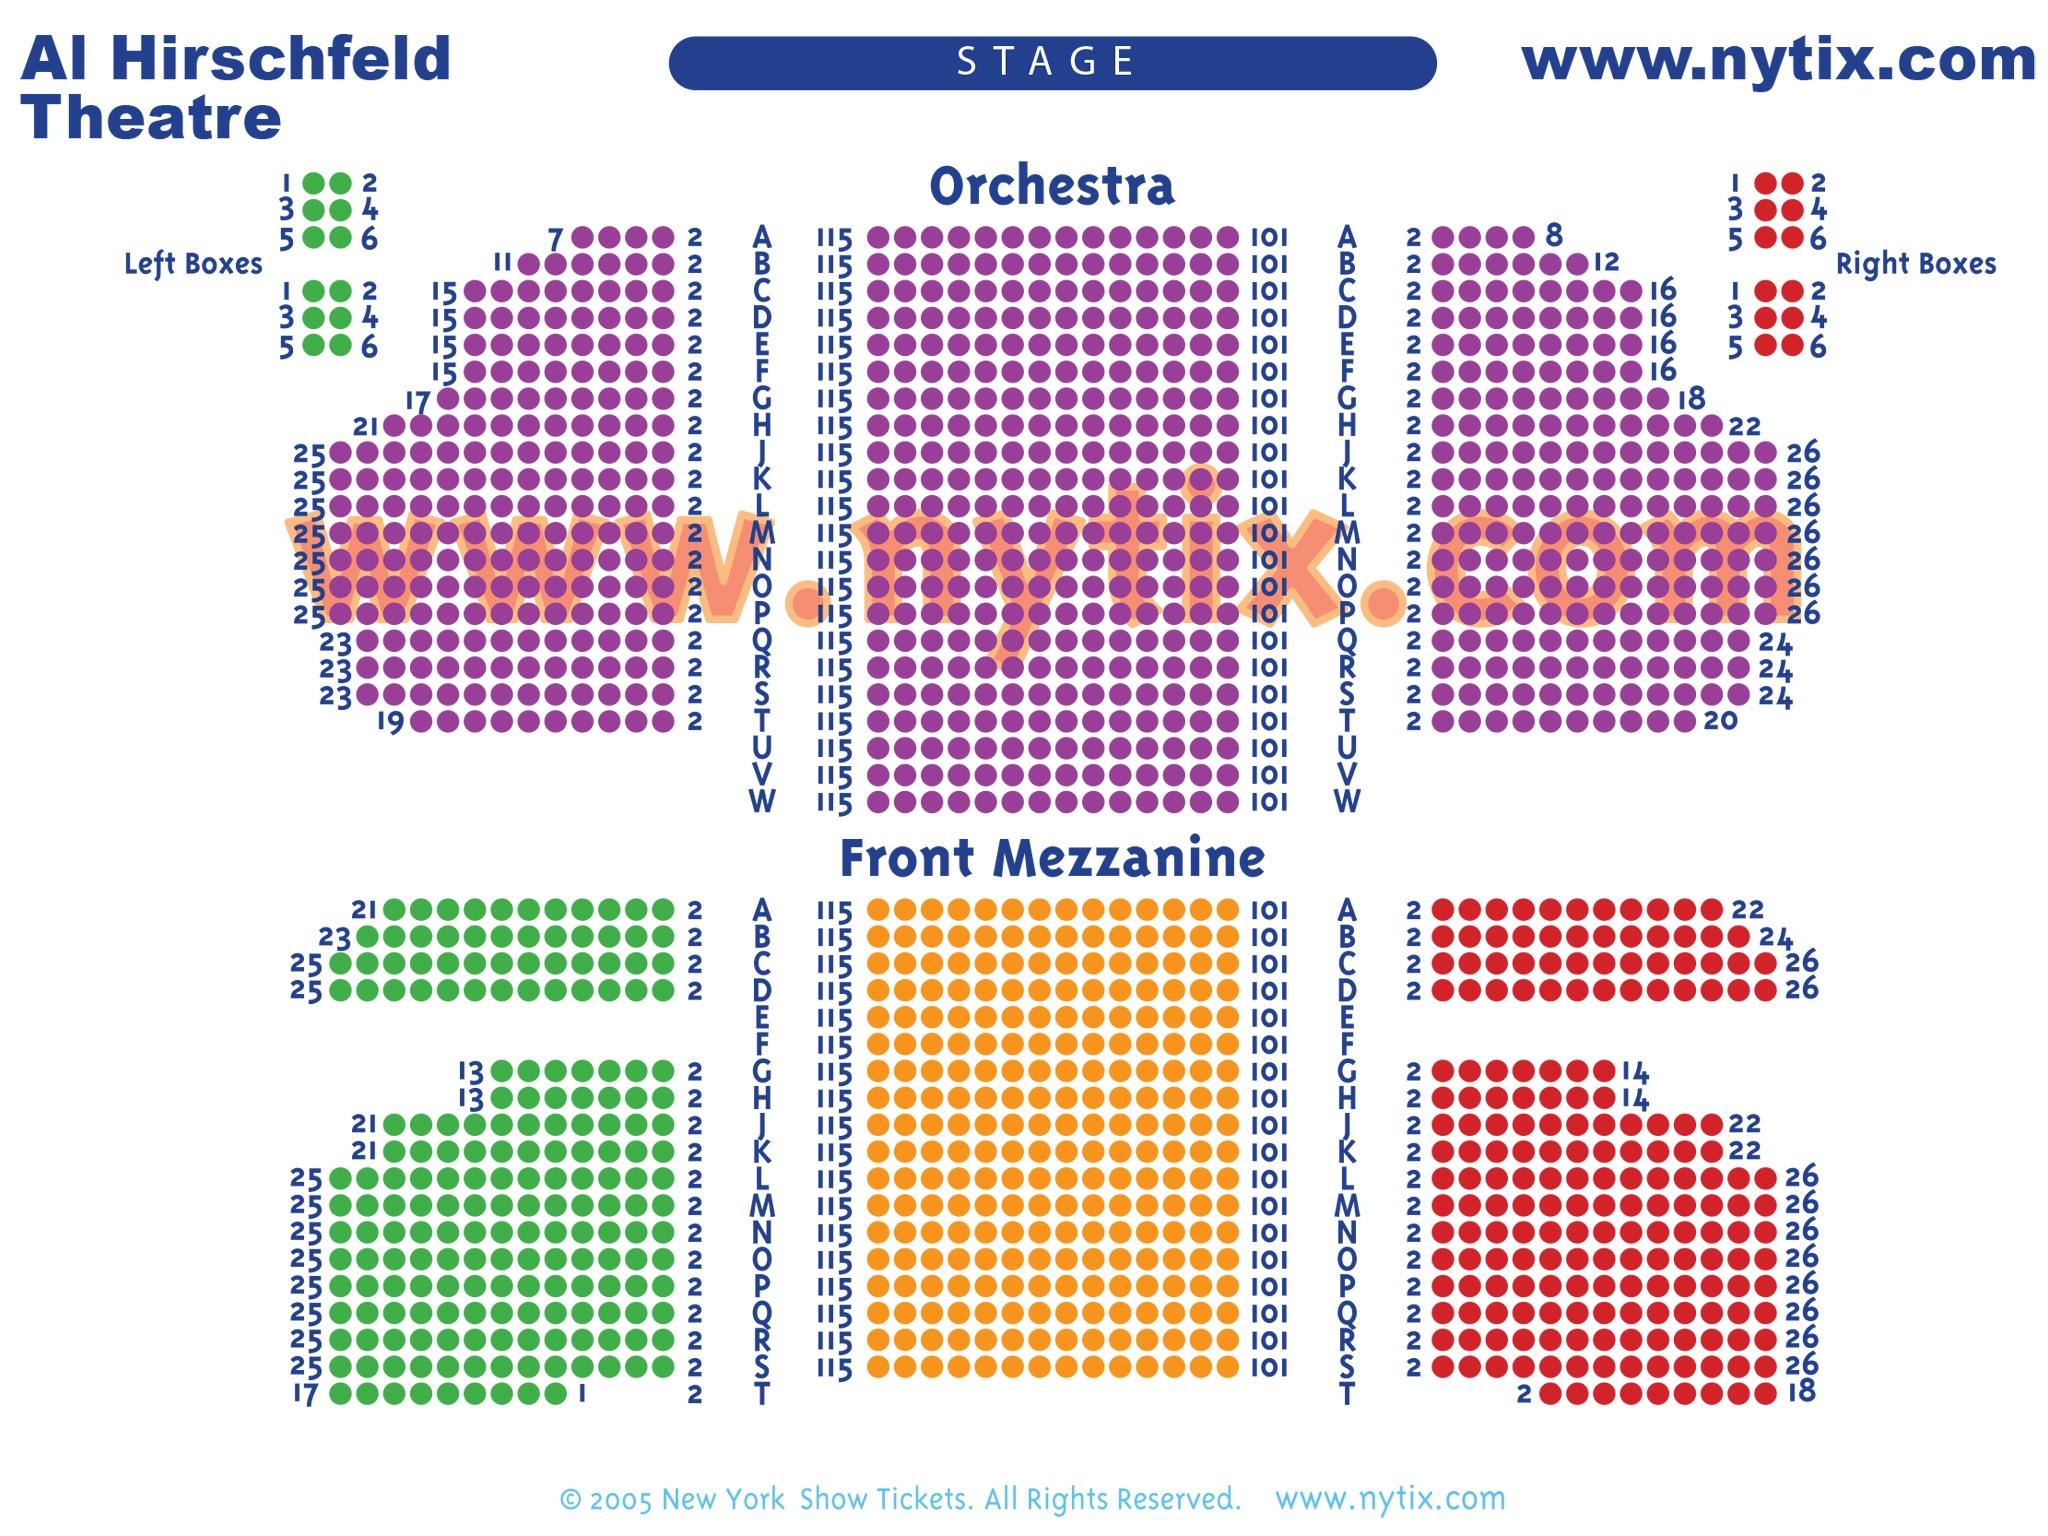 Al Hirschfeld Theatre Seating Chart